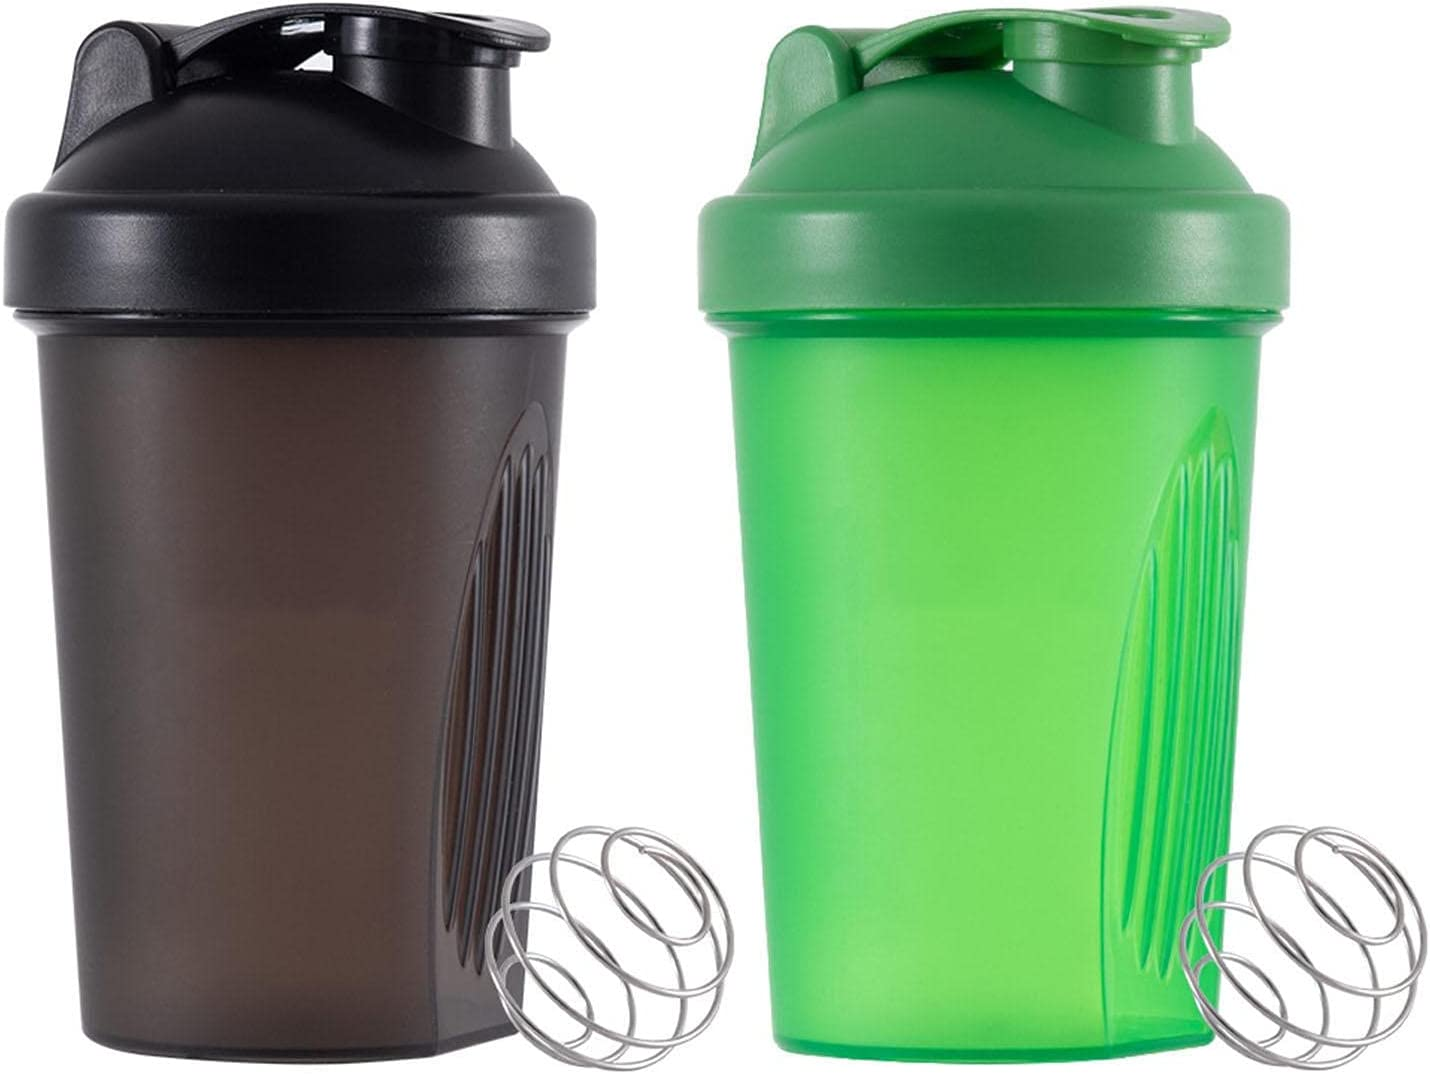 2 Pcs Shake Long-awaited Cup 400ML Shaker Bottles for Ranking TOP6 Mixes Pr Protein